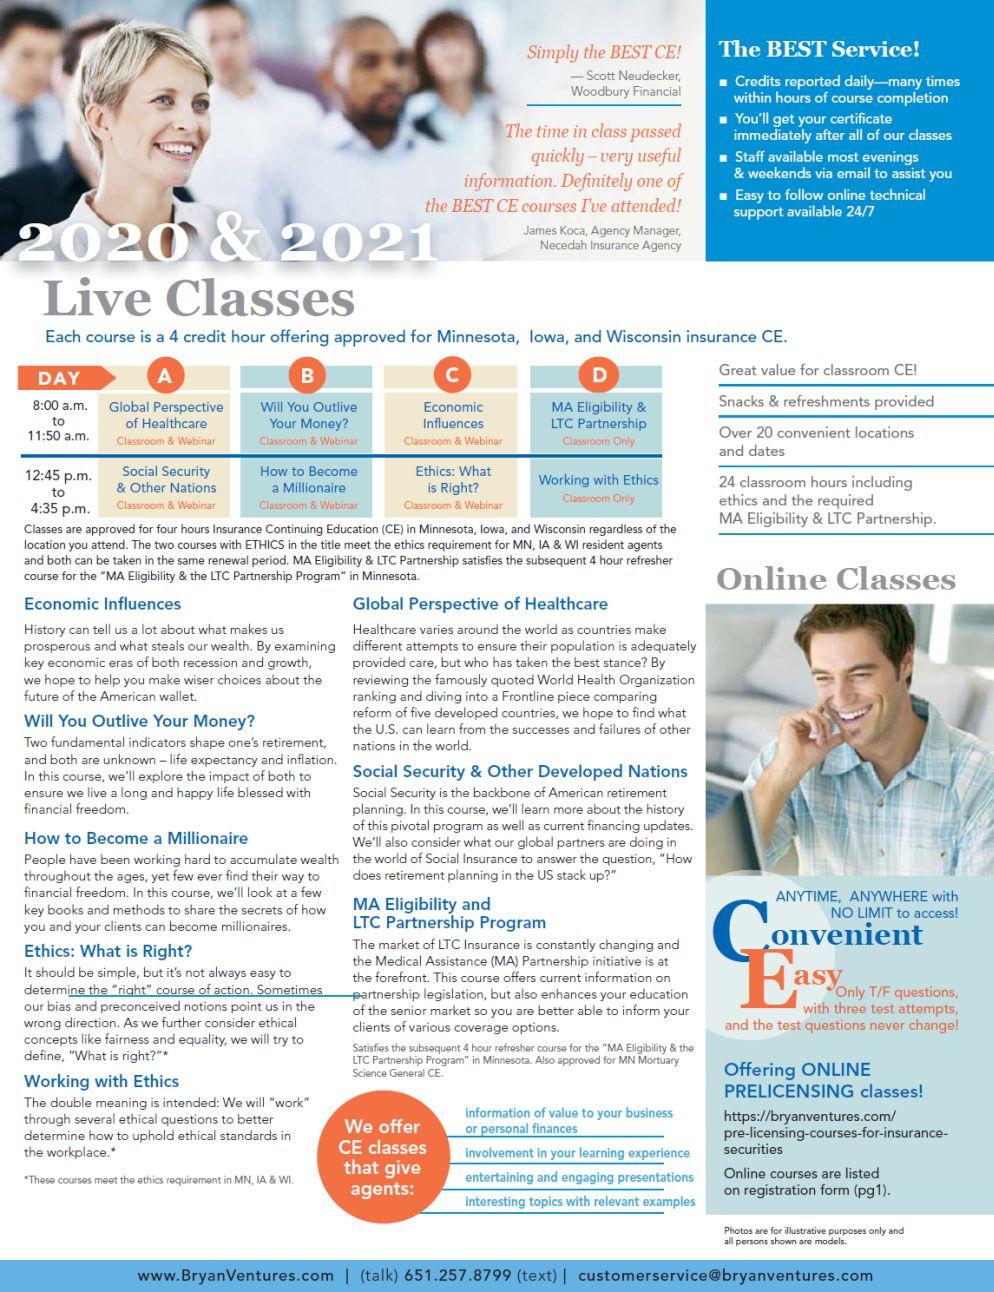 Current Live CE Courses